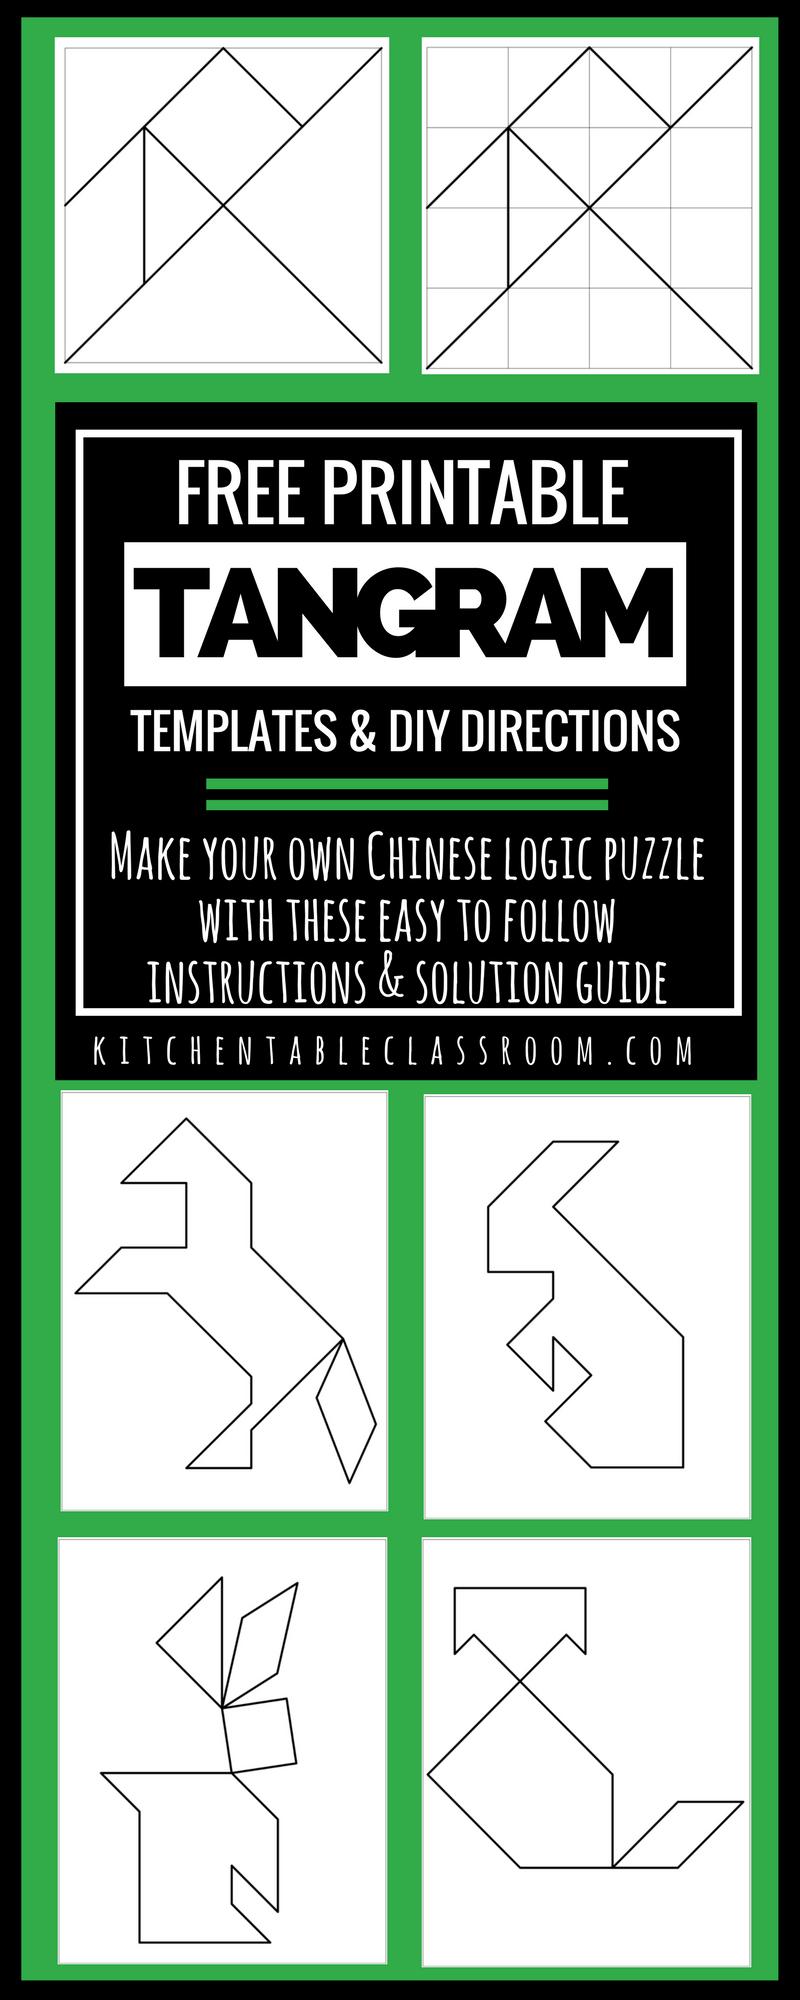 Printable Tangrams - An Easy Diy Tangram Template concernant Tangram Modèles Et Solutions